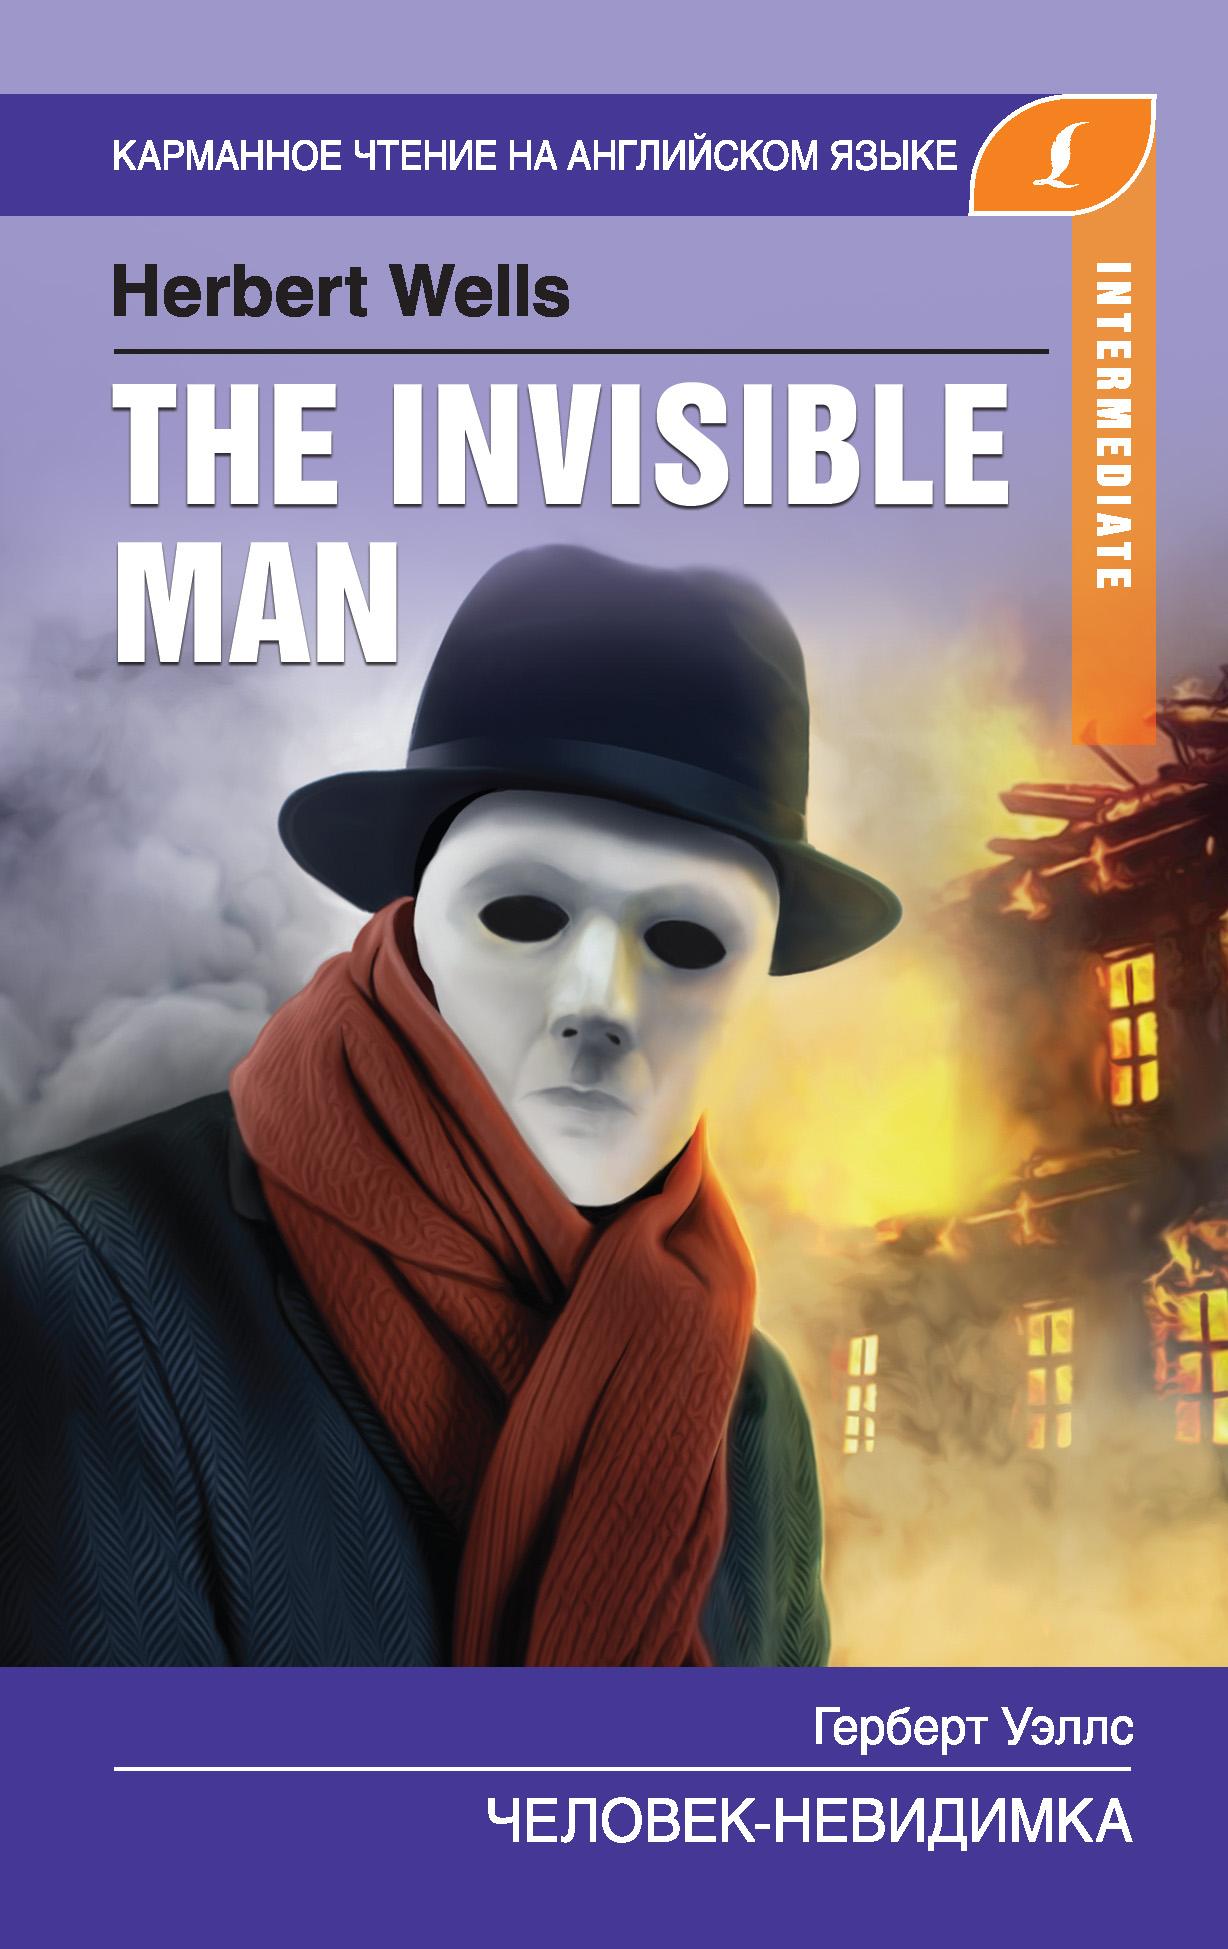 chelovek nevidimka the invisible man